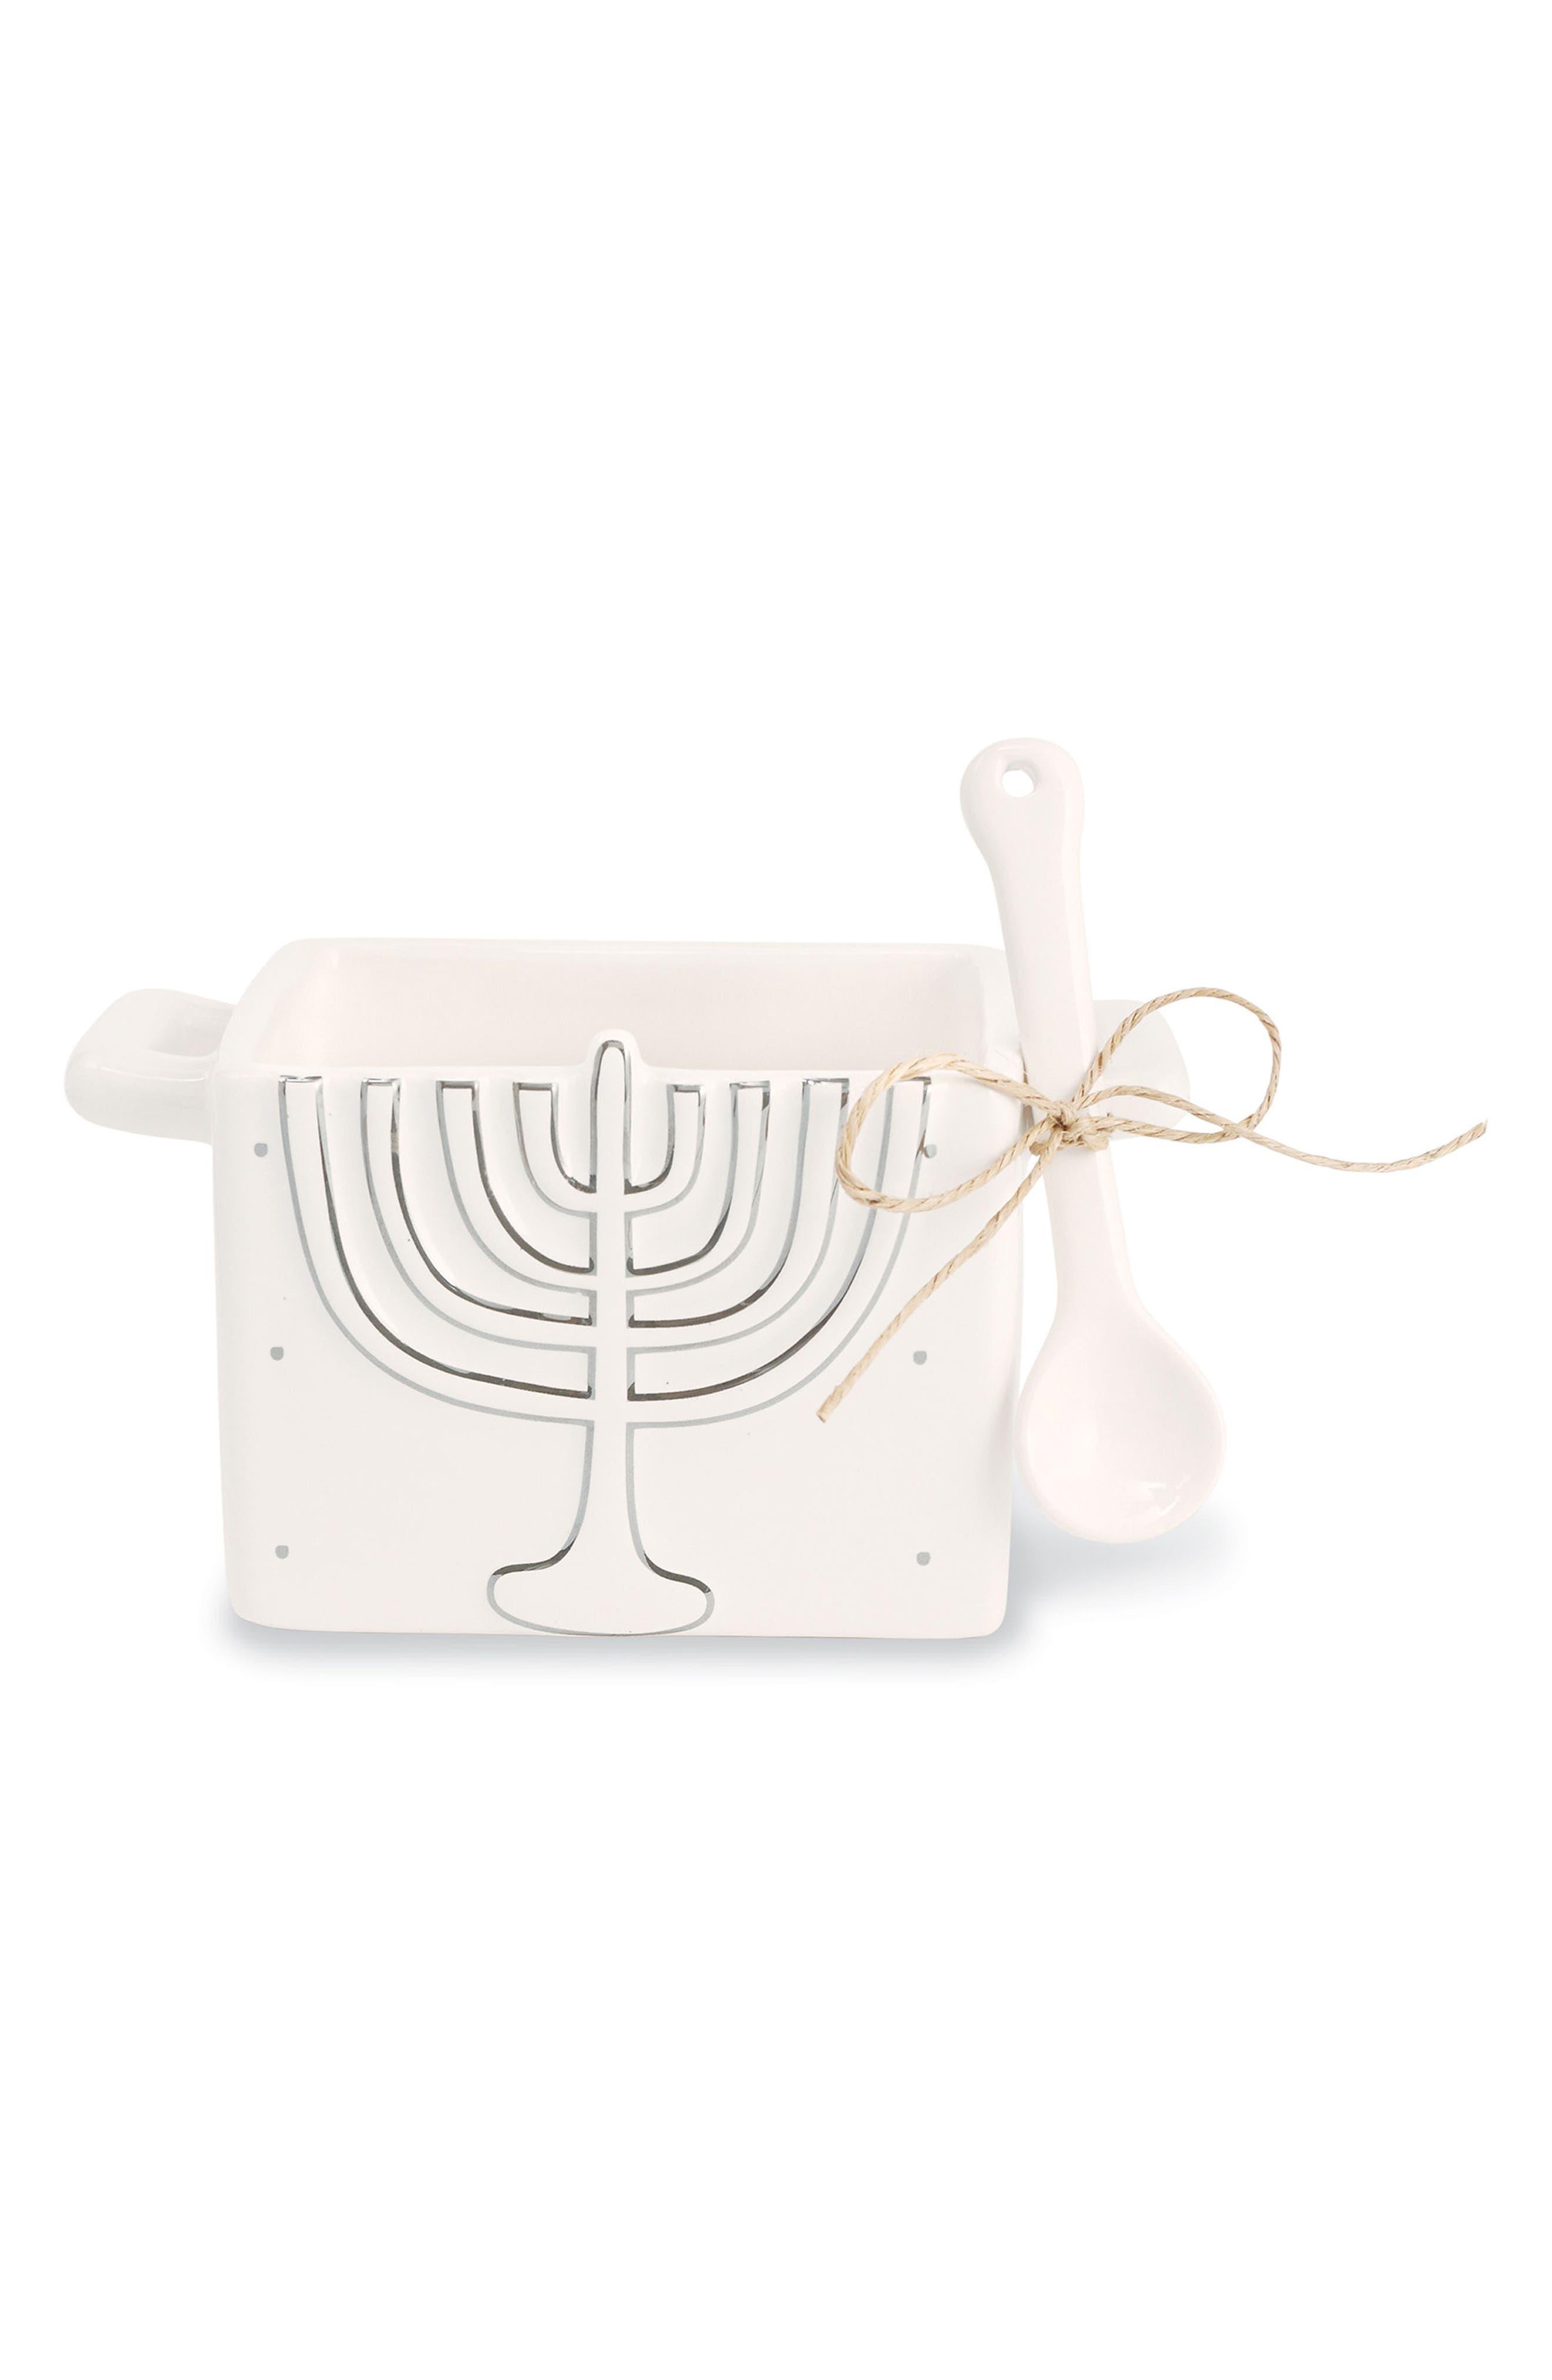 Main Image - Mud Pie Menorah Hanukkah Candy Caddy & Spoon